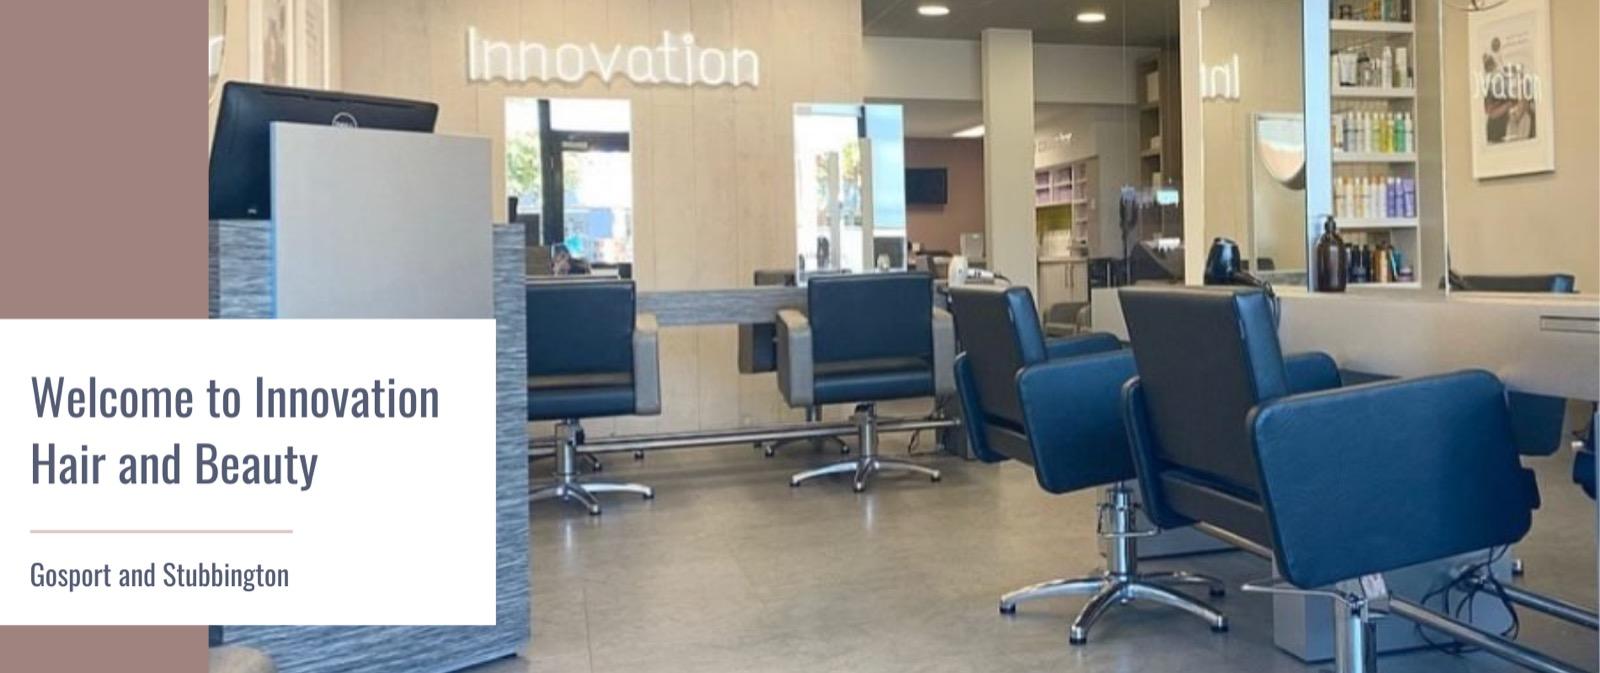 Innovation Hair and Beauty